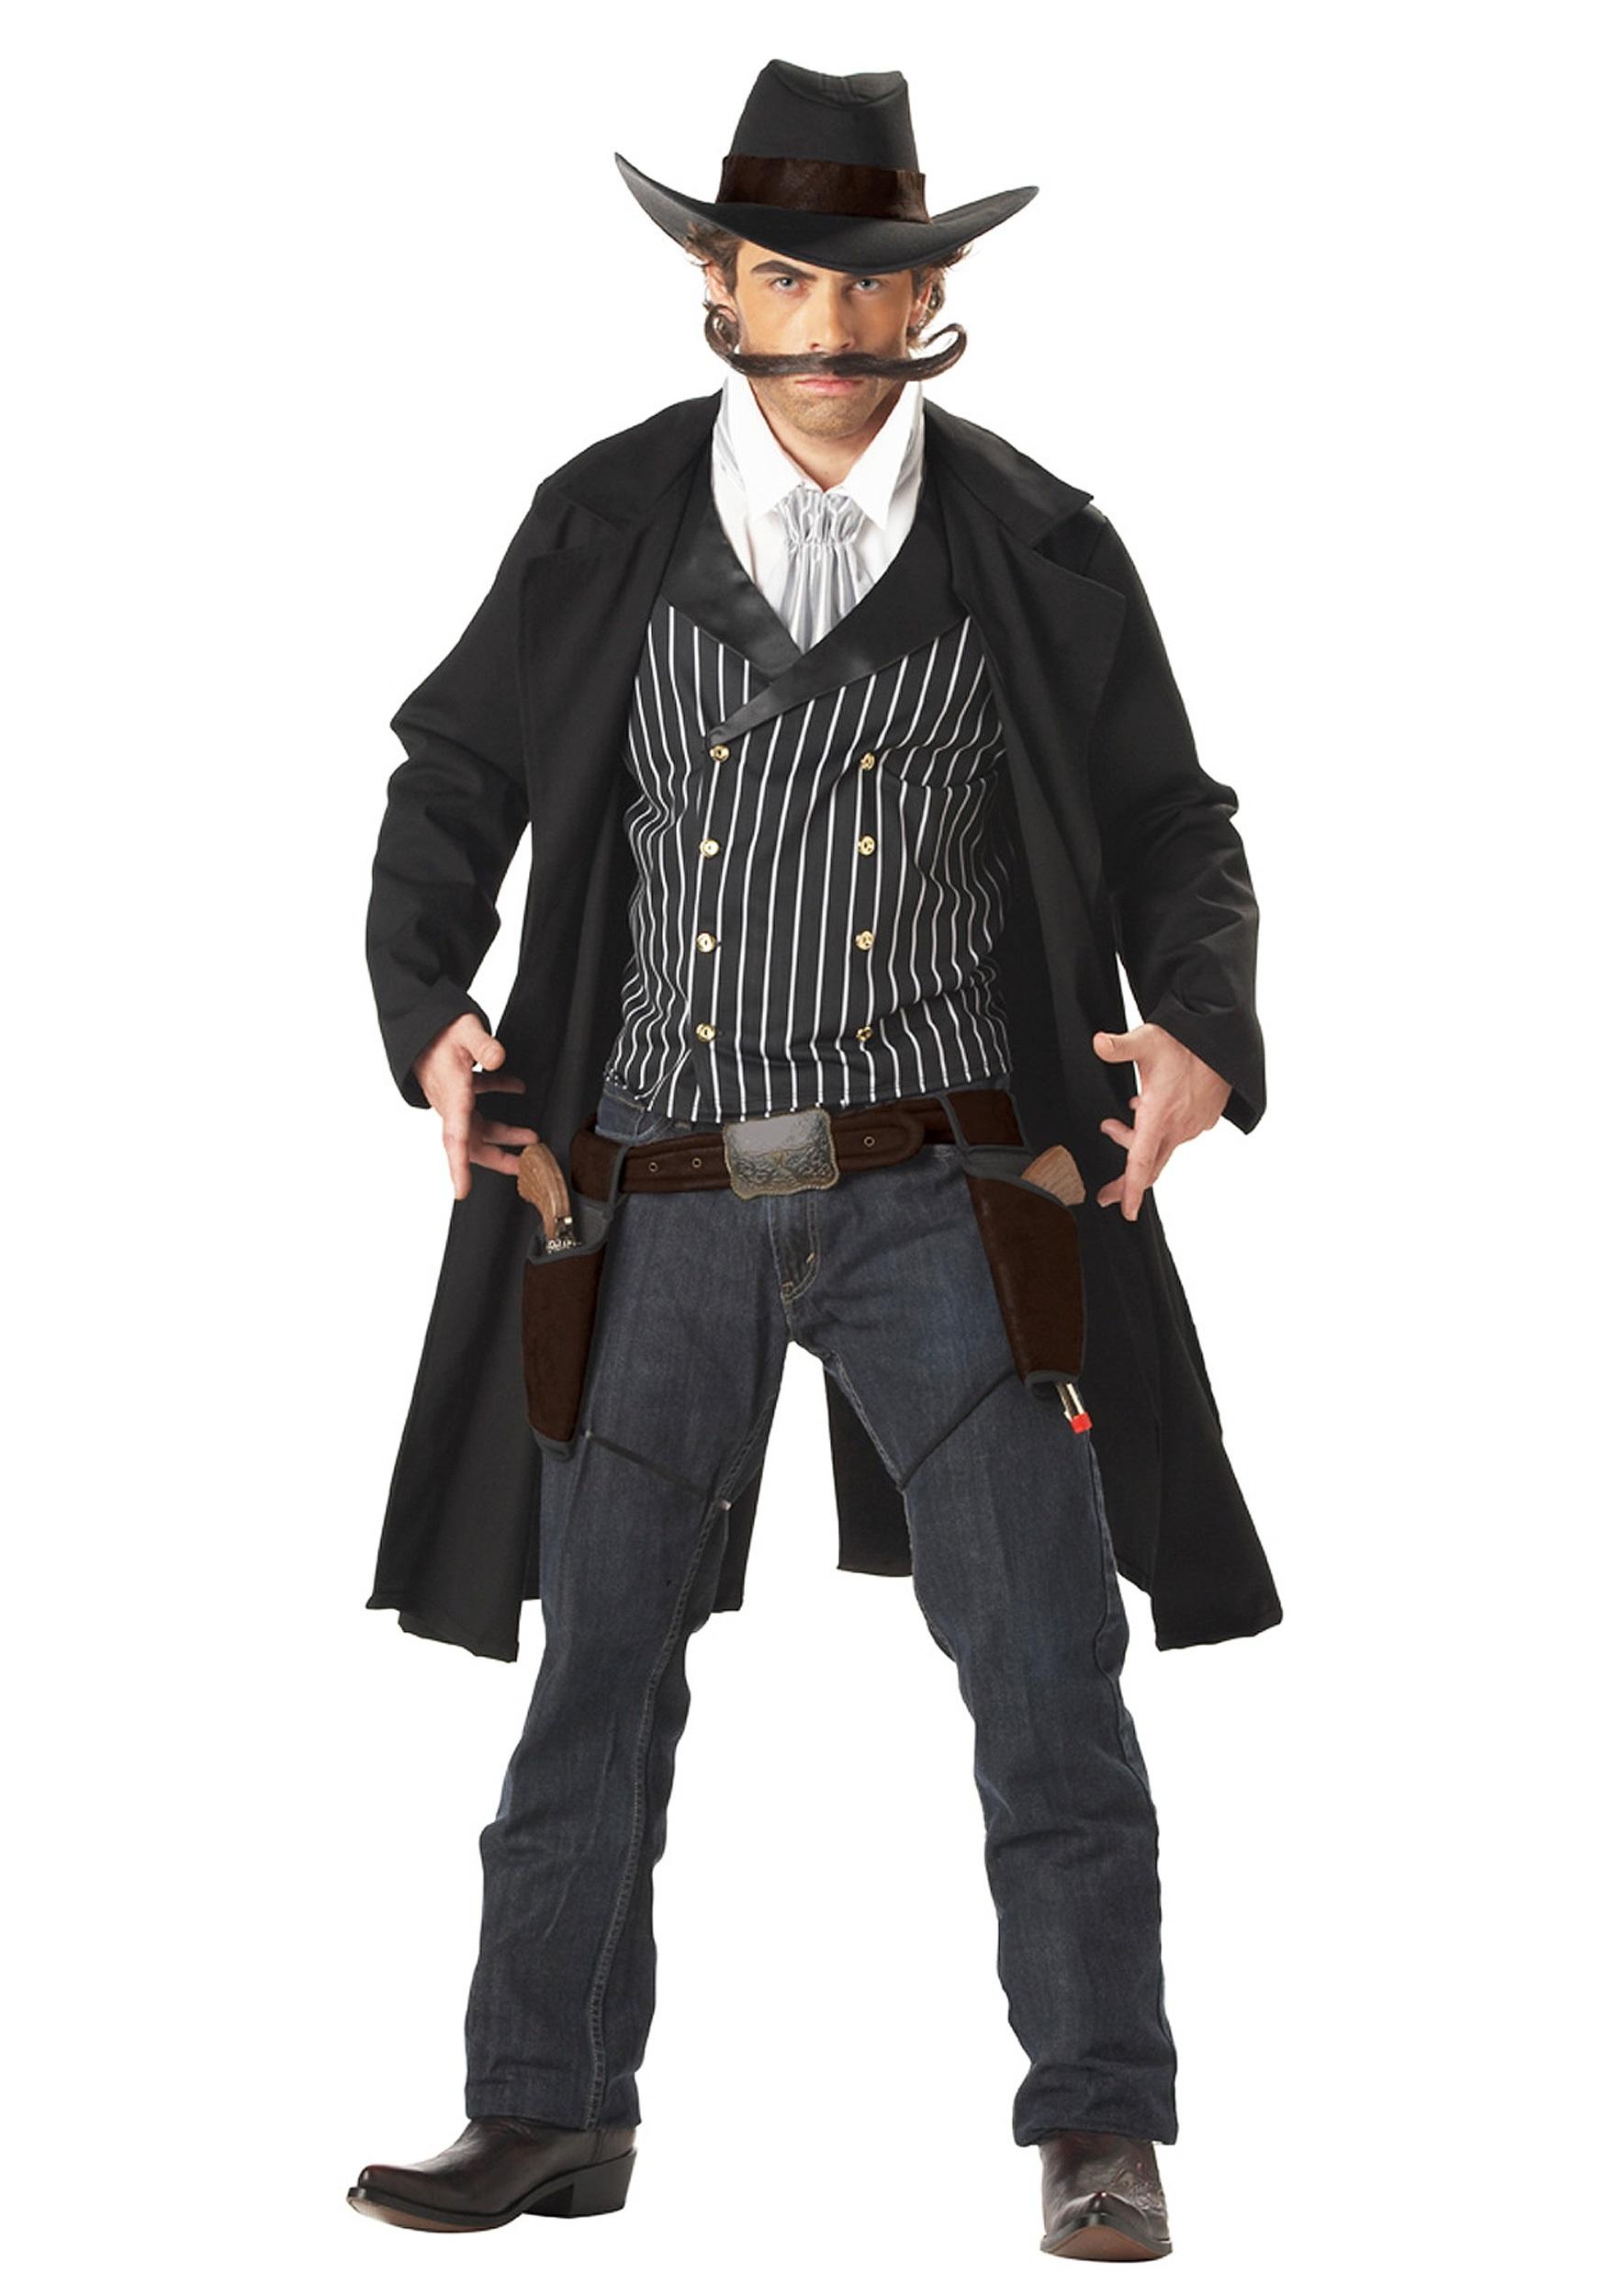 adult-gunfighter-western-costume.jpg 3f7ecd7206b